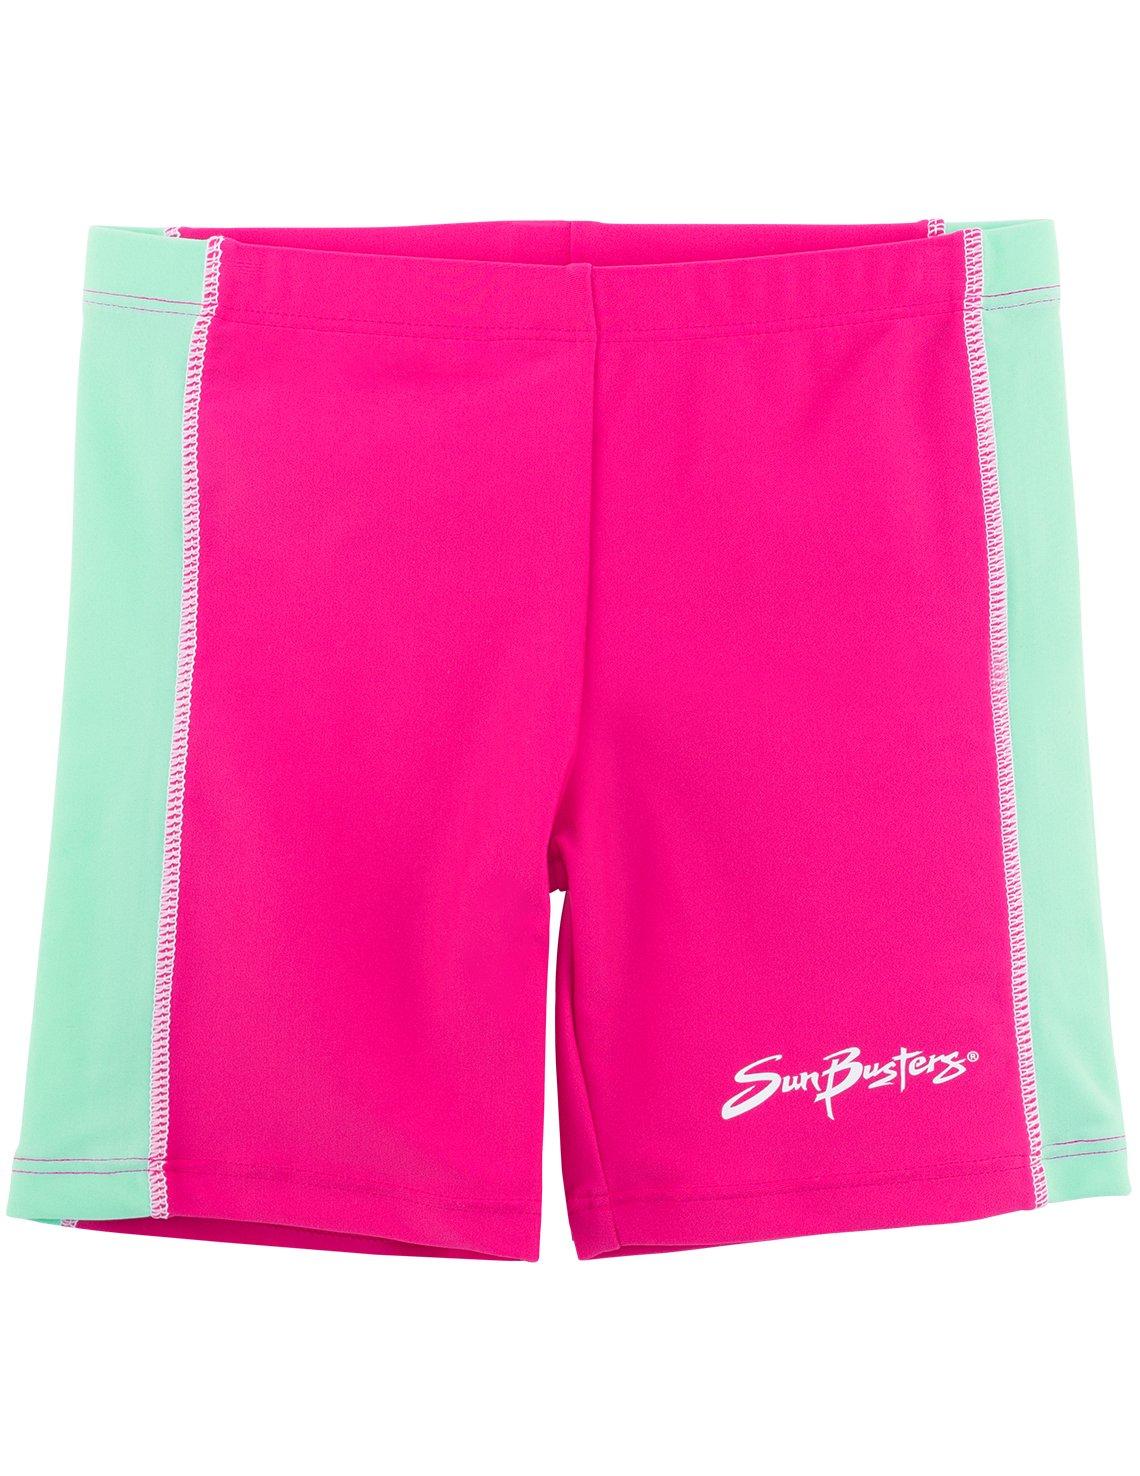 SunBusters Girls Swim Shorts 12 mos - 12 yrs, UPF 50+ Sun Protection